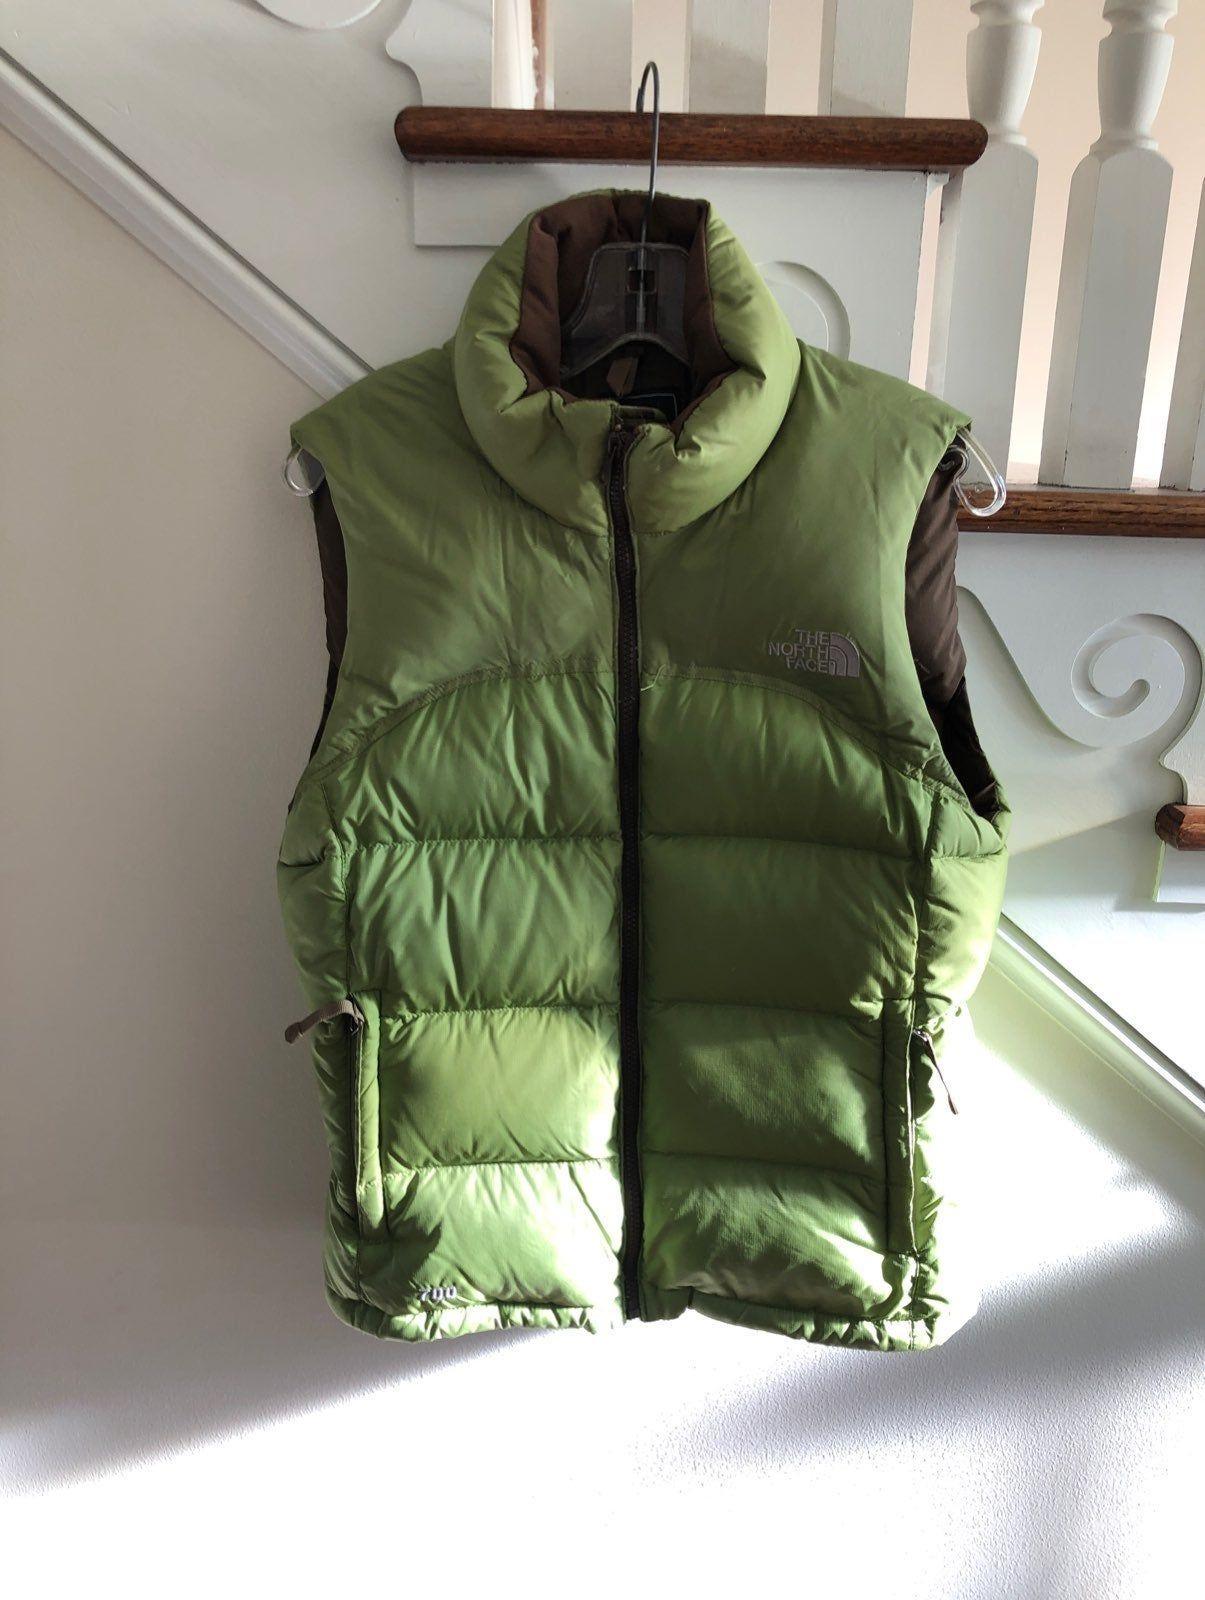 Lime Green North Face Women S Vest Puffer Vest Outfit Green North Face Green North Face Puffer [ 1600 x 1205 Pixel ]